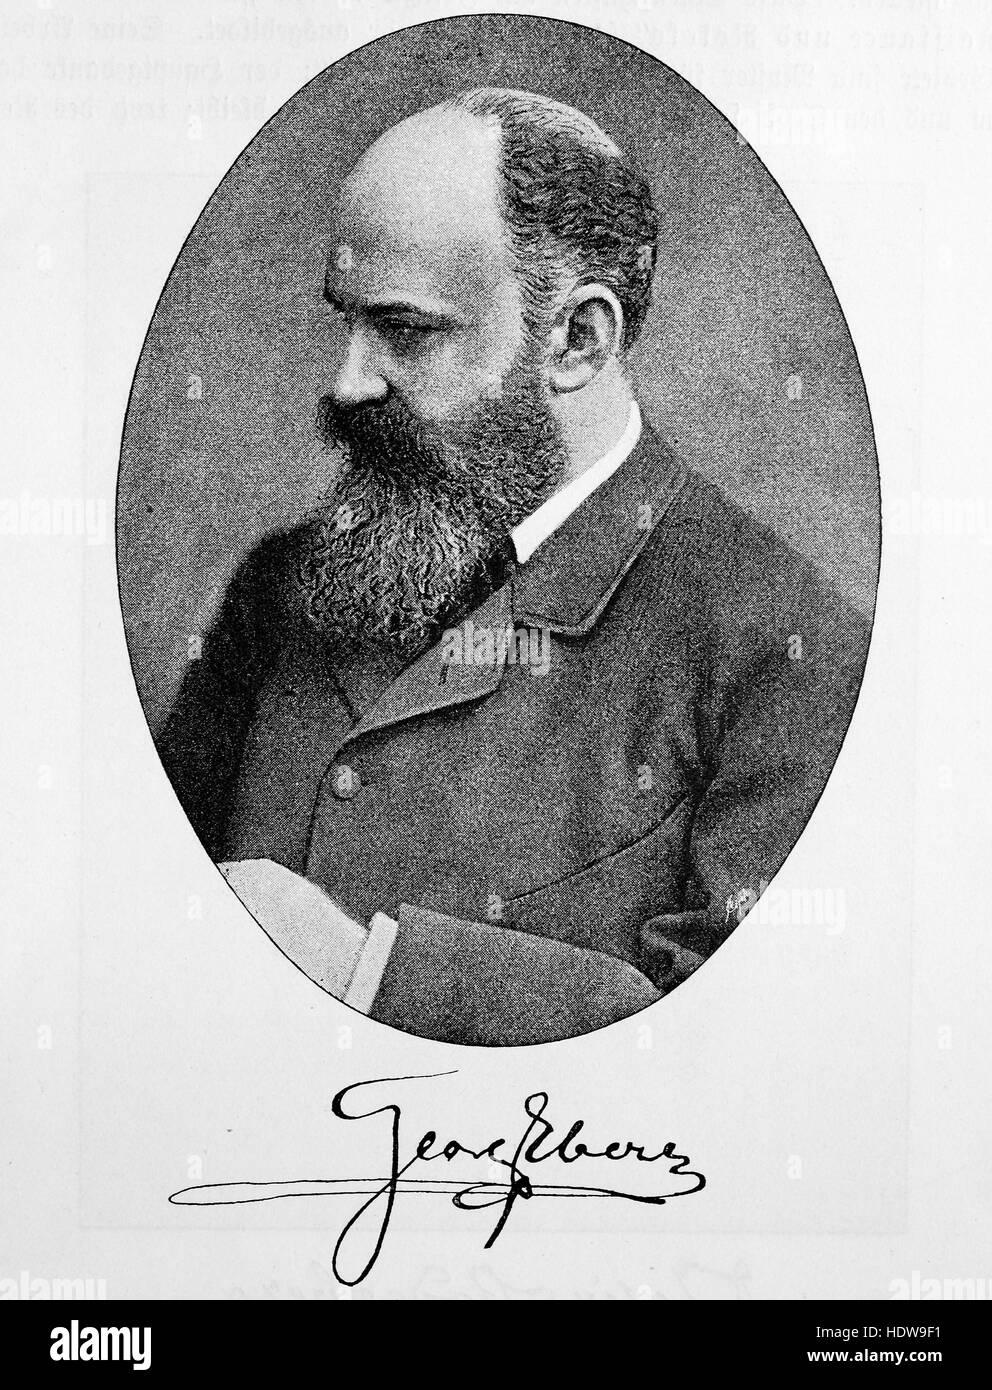 Georg Moritz Ebers, 1837-1898, German Egyptologist and novelist, woodcut from the year 1880 - Stock Image